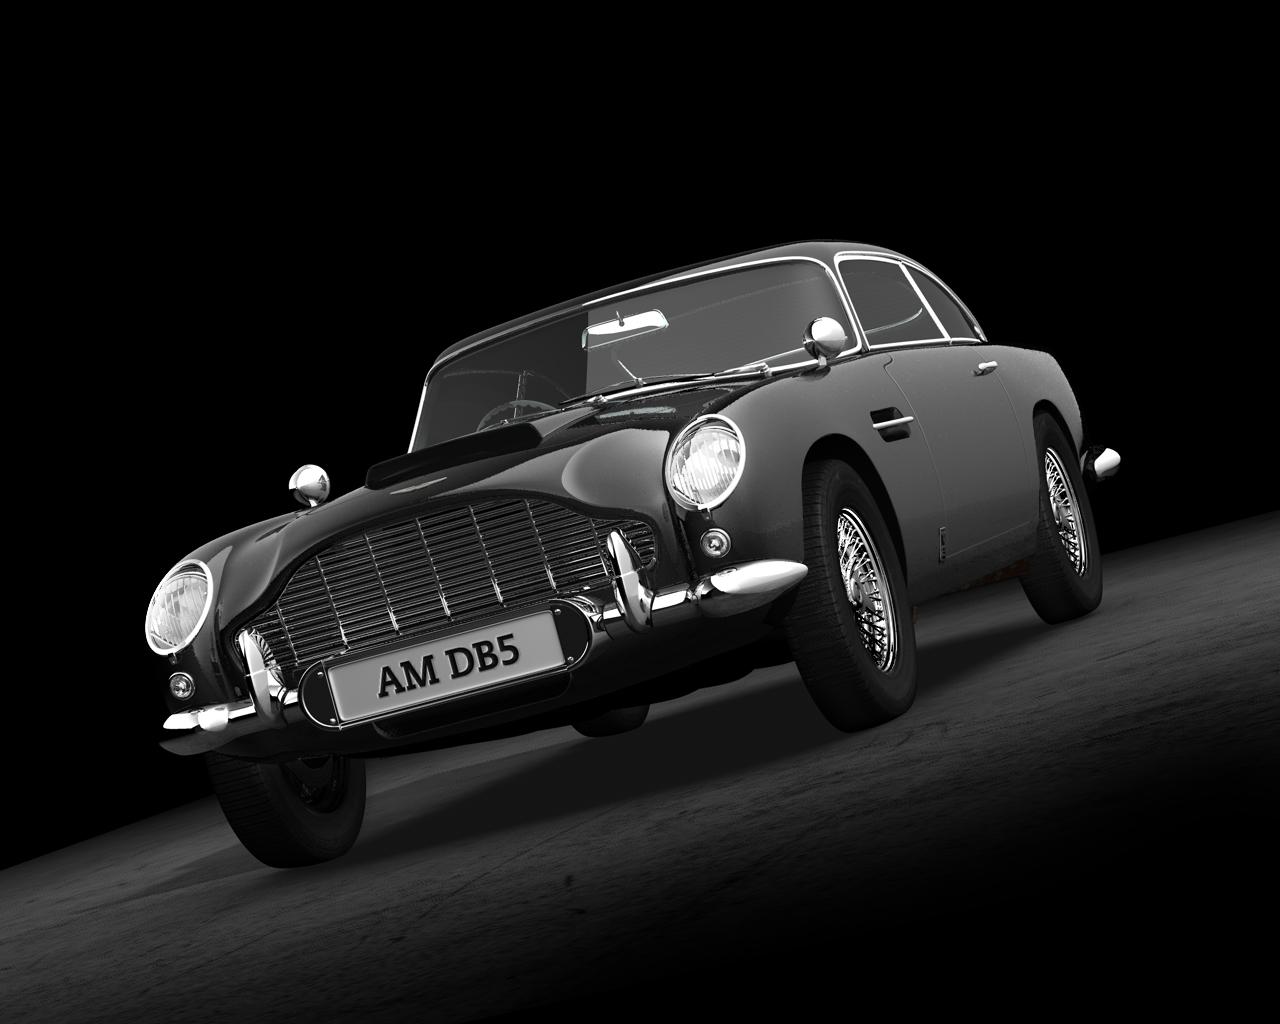 Aston Martin DB5 II by Vacuita Wallpapers 1280x1024